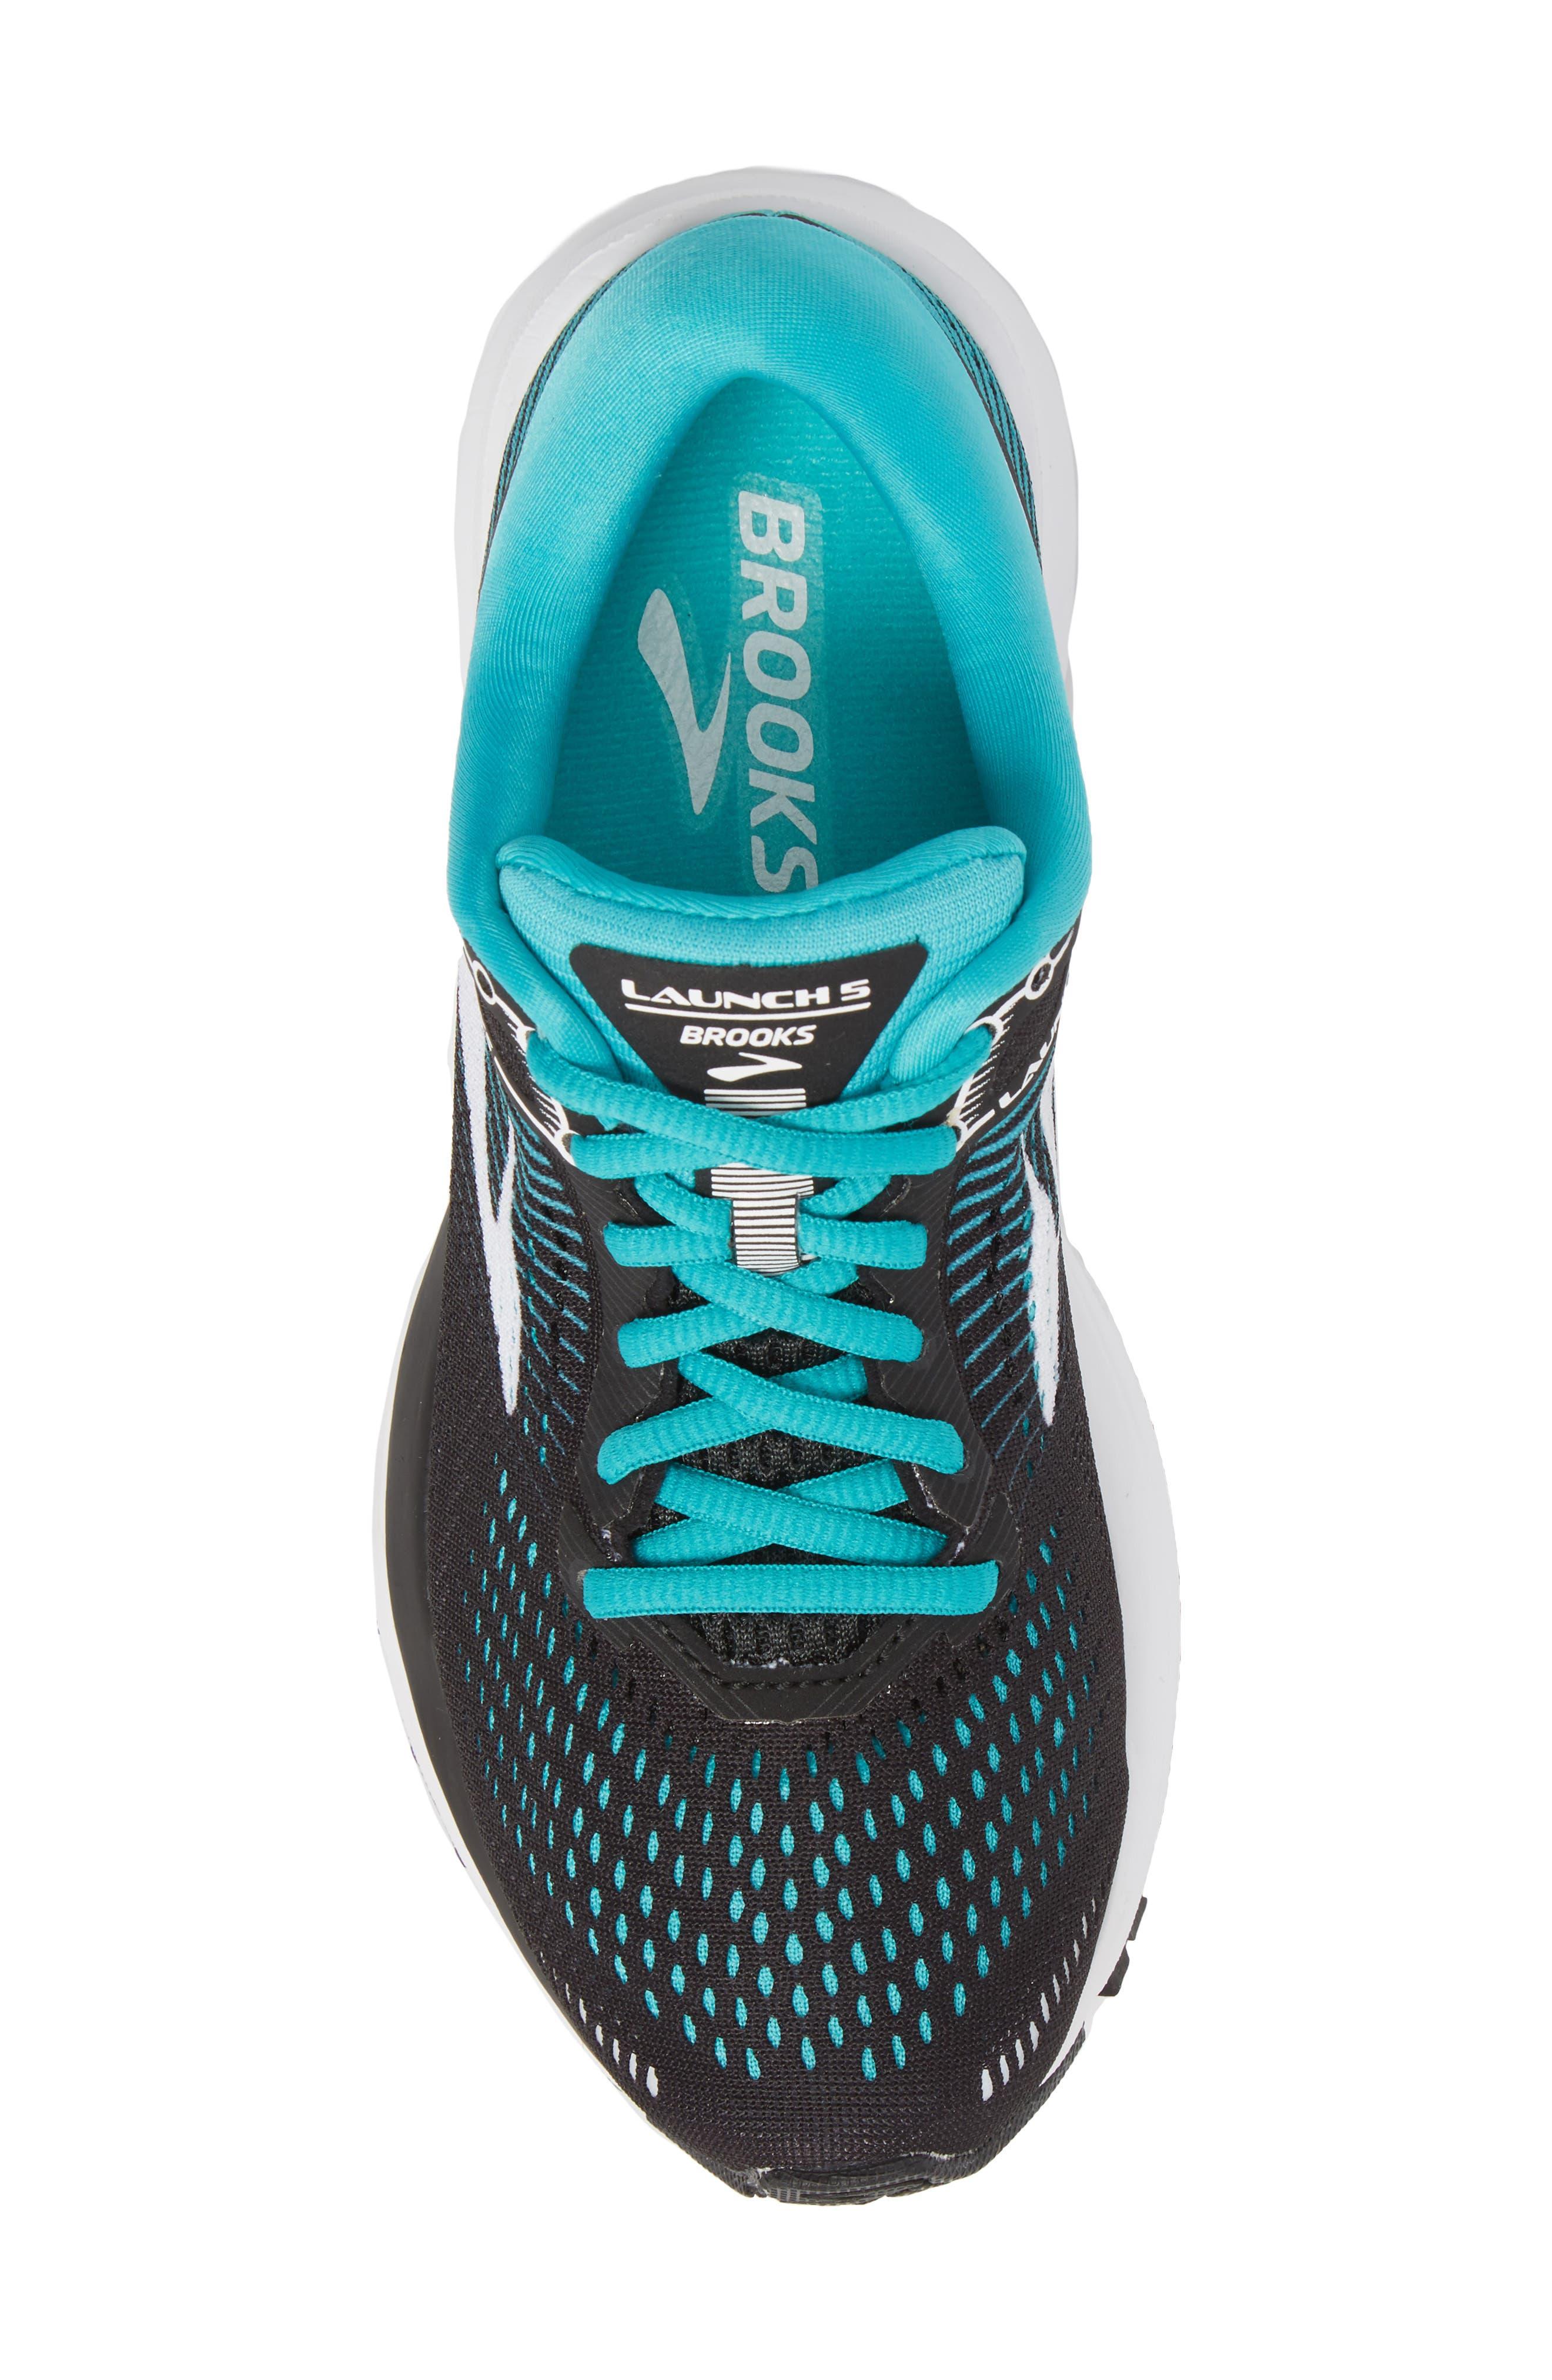 BROOKS,                             Launch 5 Running Shoe,                             Alternate thumbnail 5, color,                             BLACK/ TEAL GREEN/ WHITE